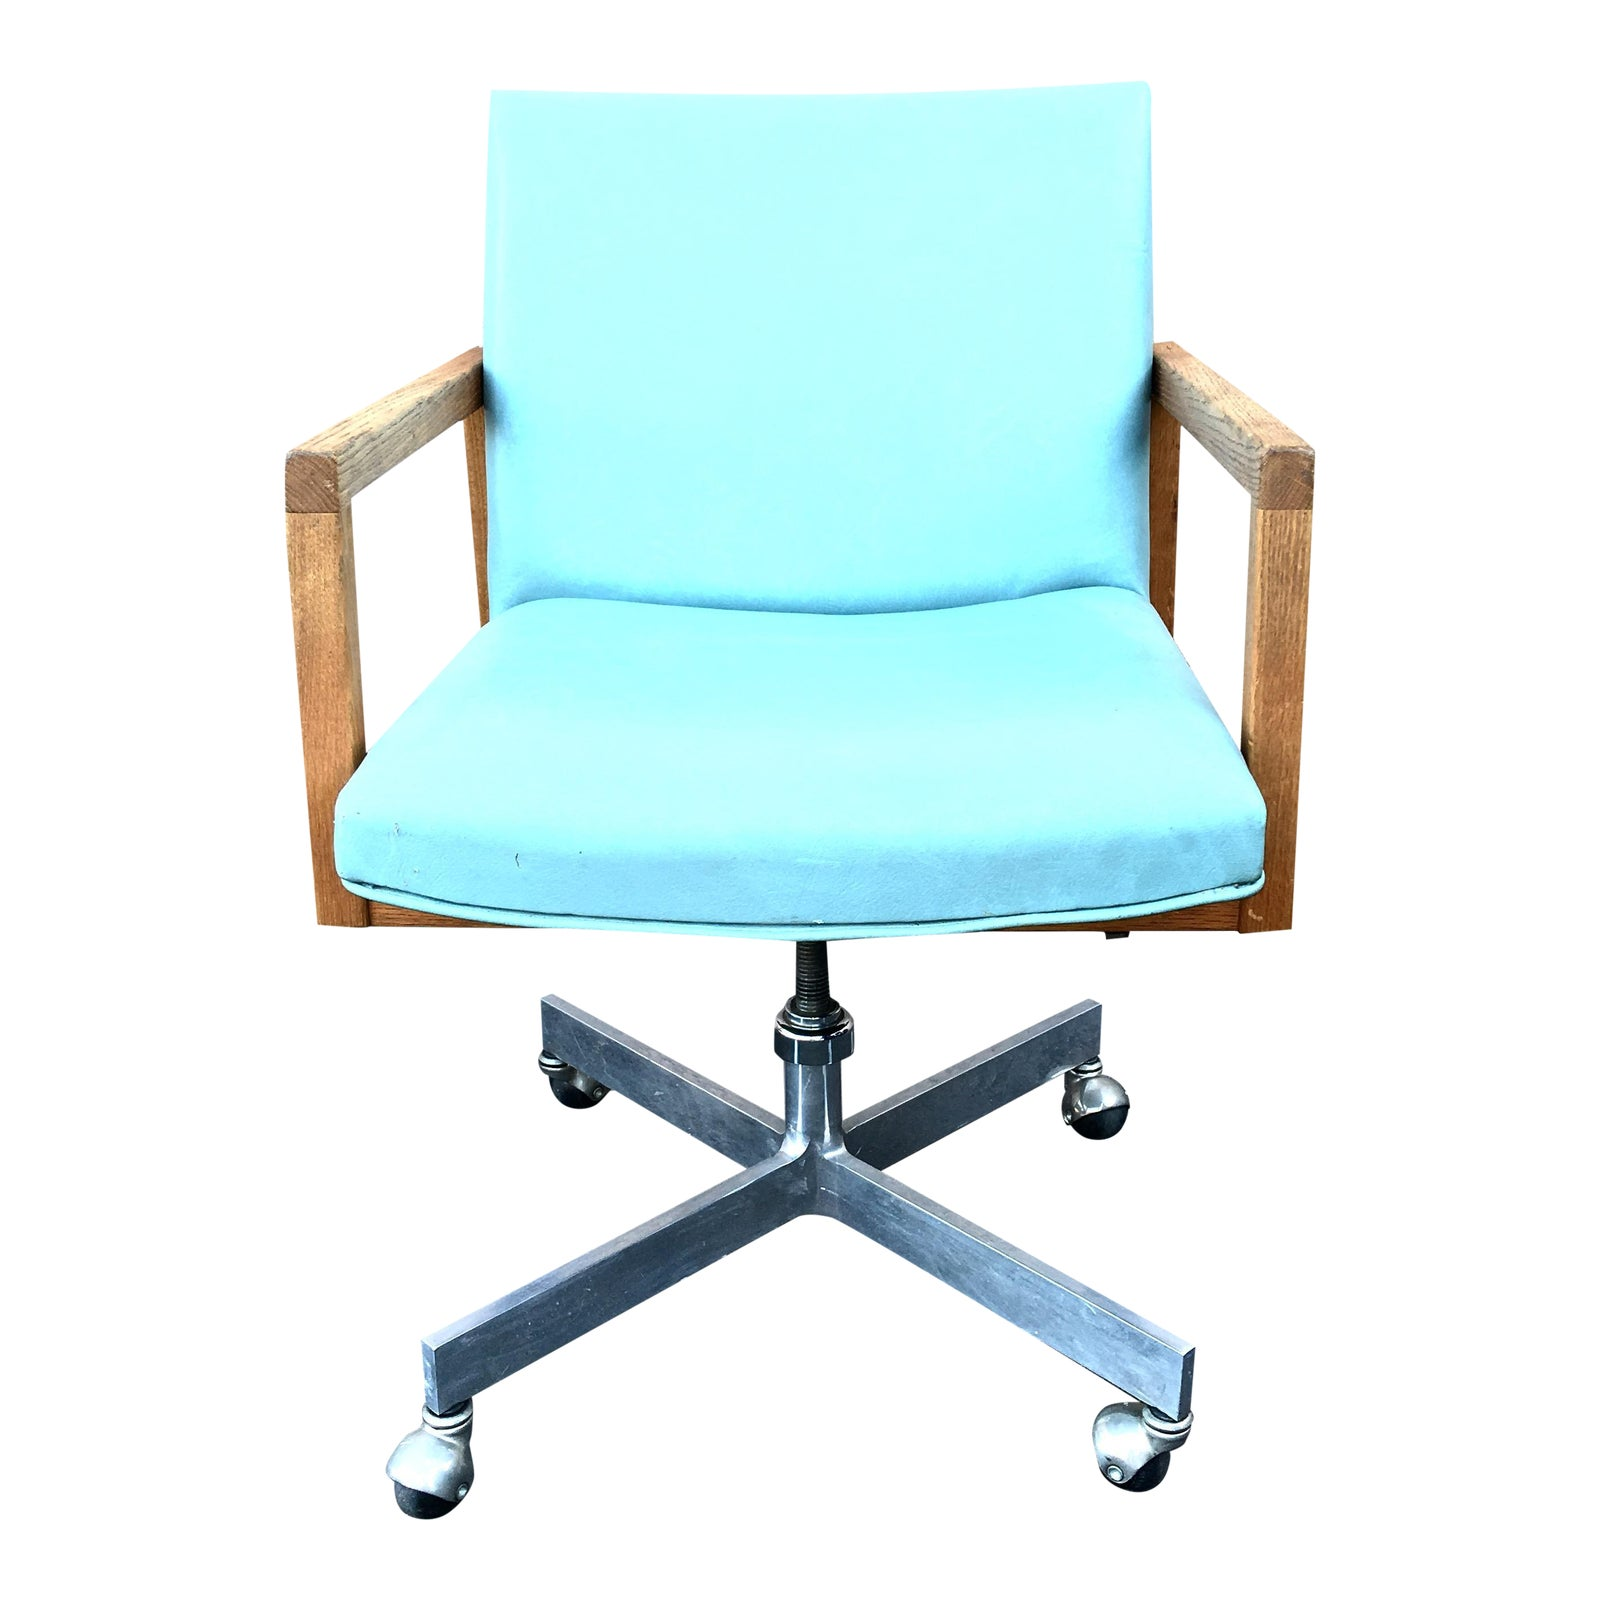 Mid century modern seafoam green office chair chairish